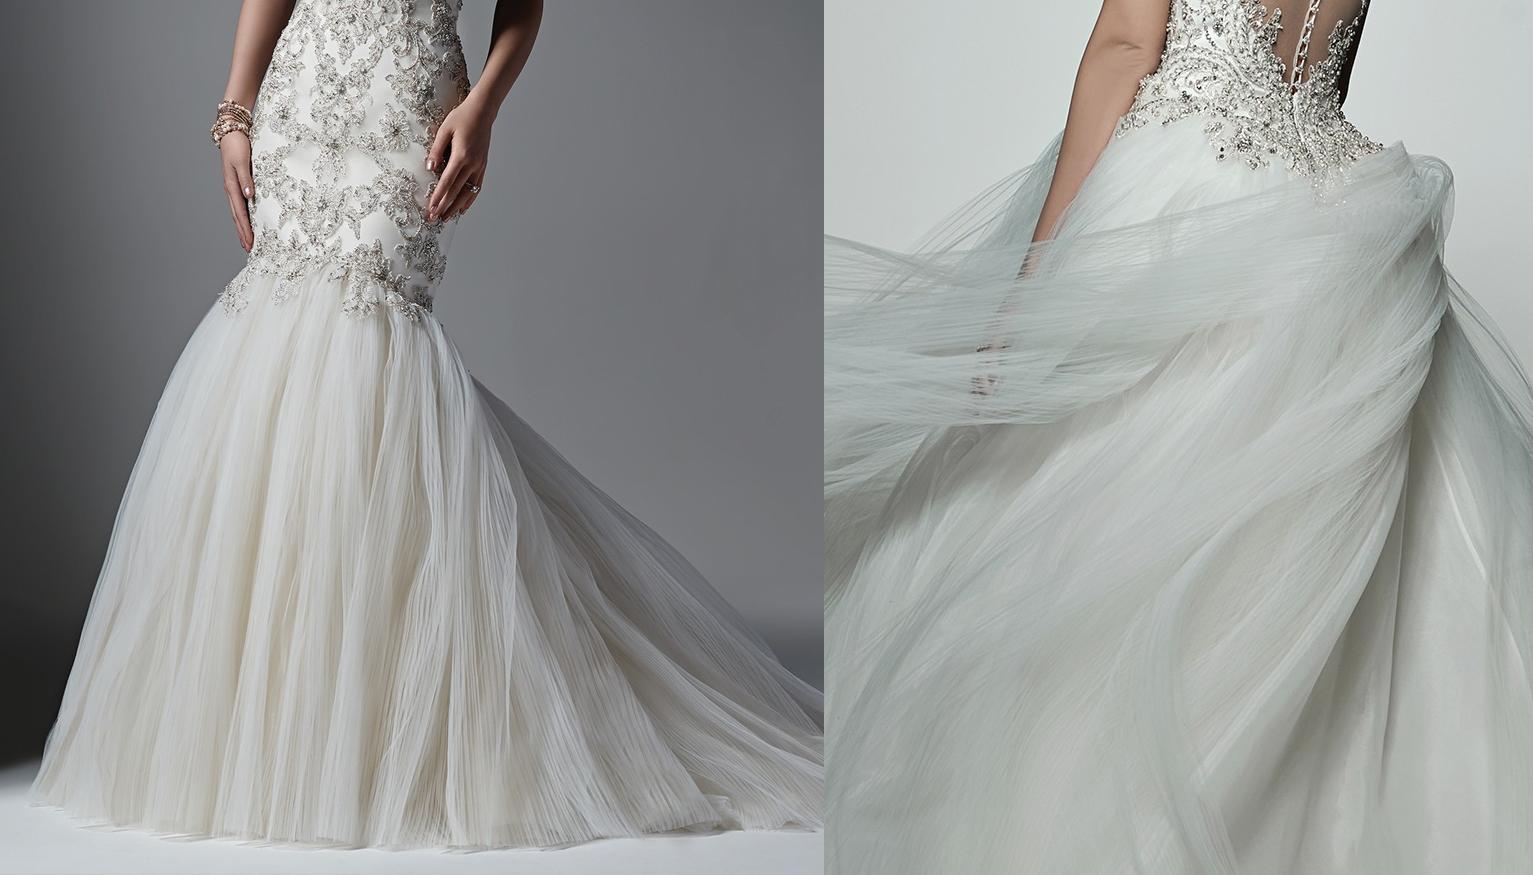 Wedding Dress Fabric.Where To Buy Wedding Gown Material Saddha